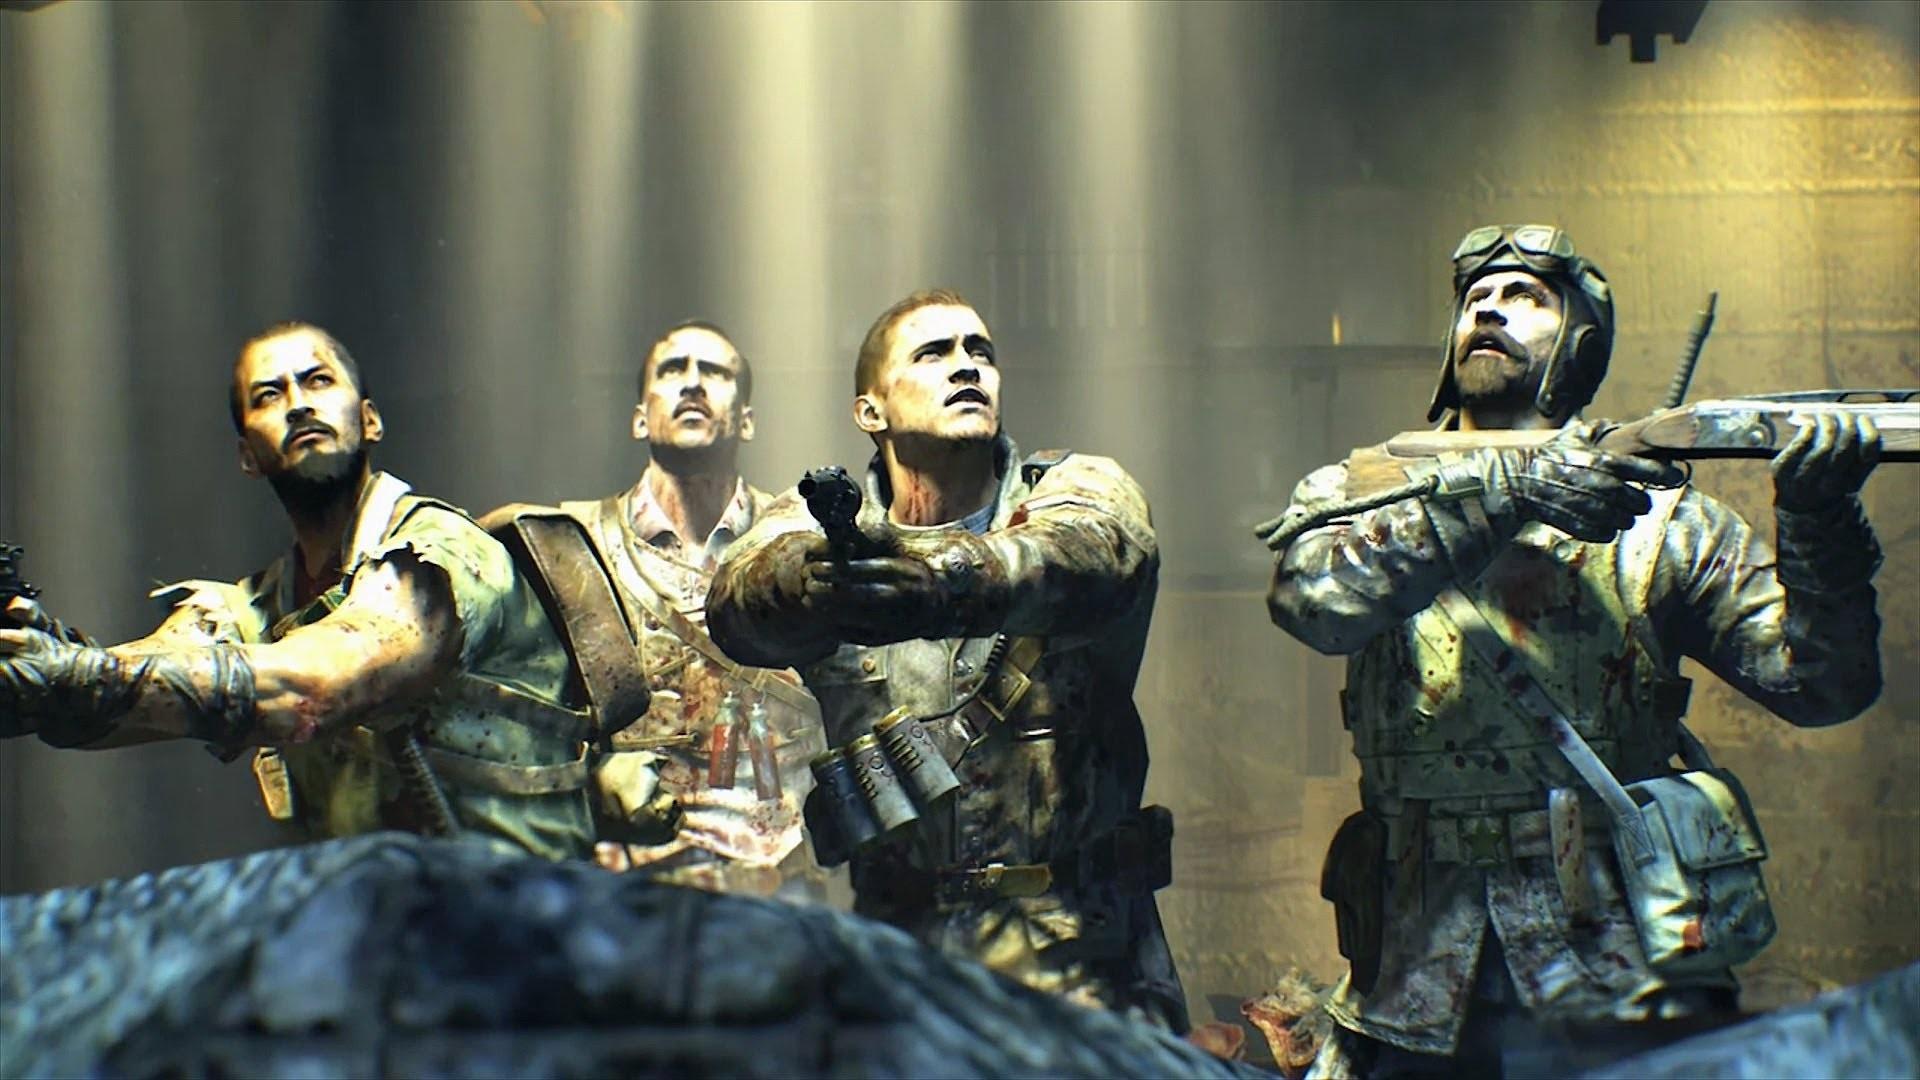 BLACK OPS 2 ZOMBIES РORIGINS GAMEPLAY / Apocalypse DLC (Portugu̻s PT-BR) Р YouTube